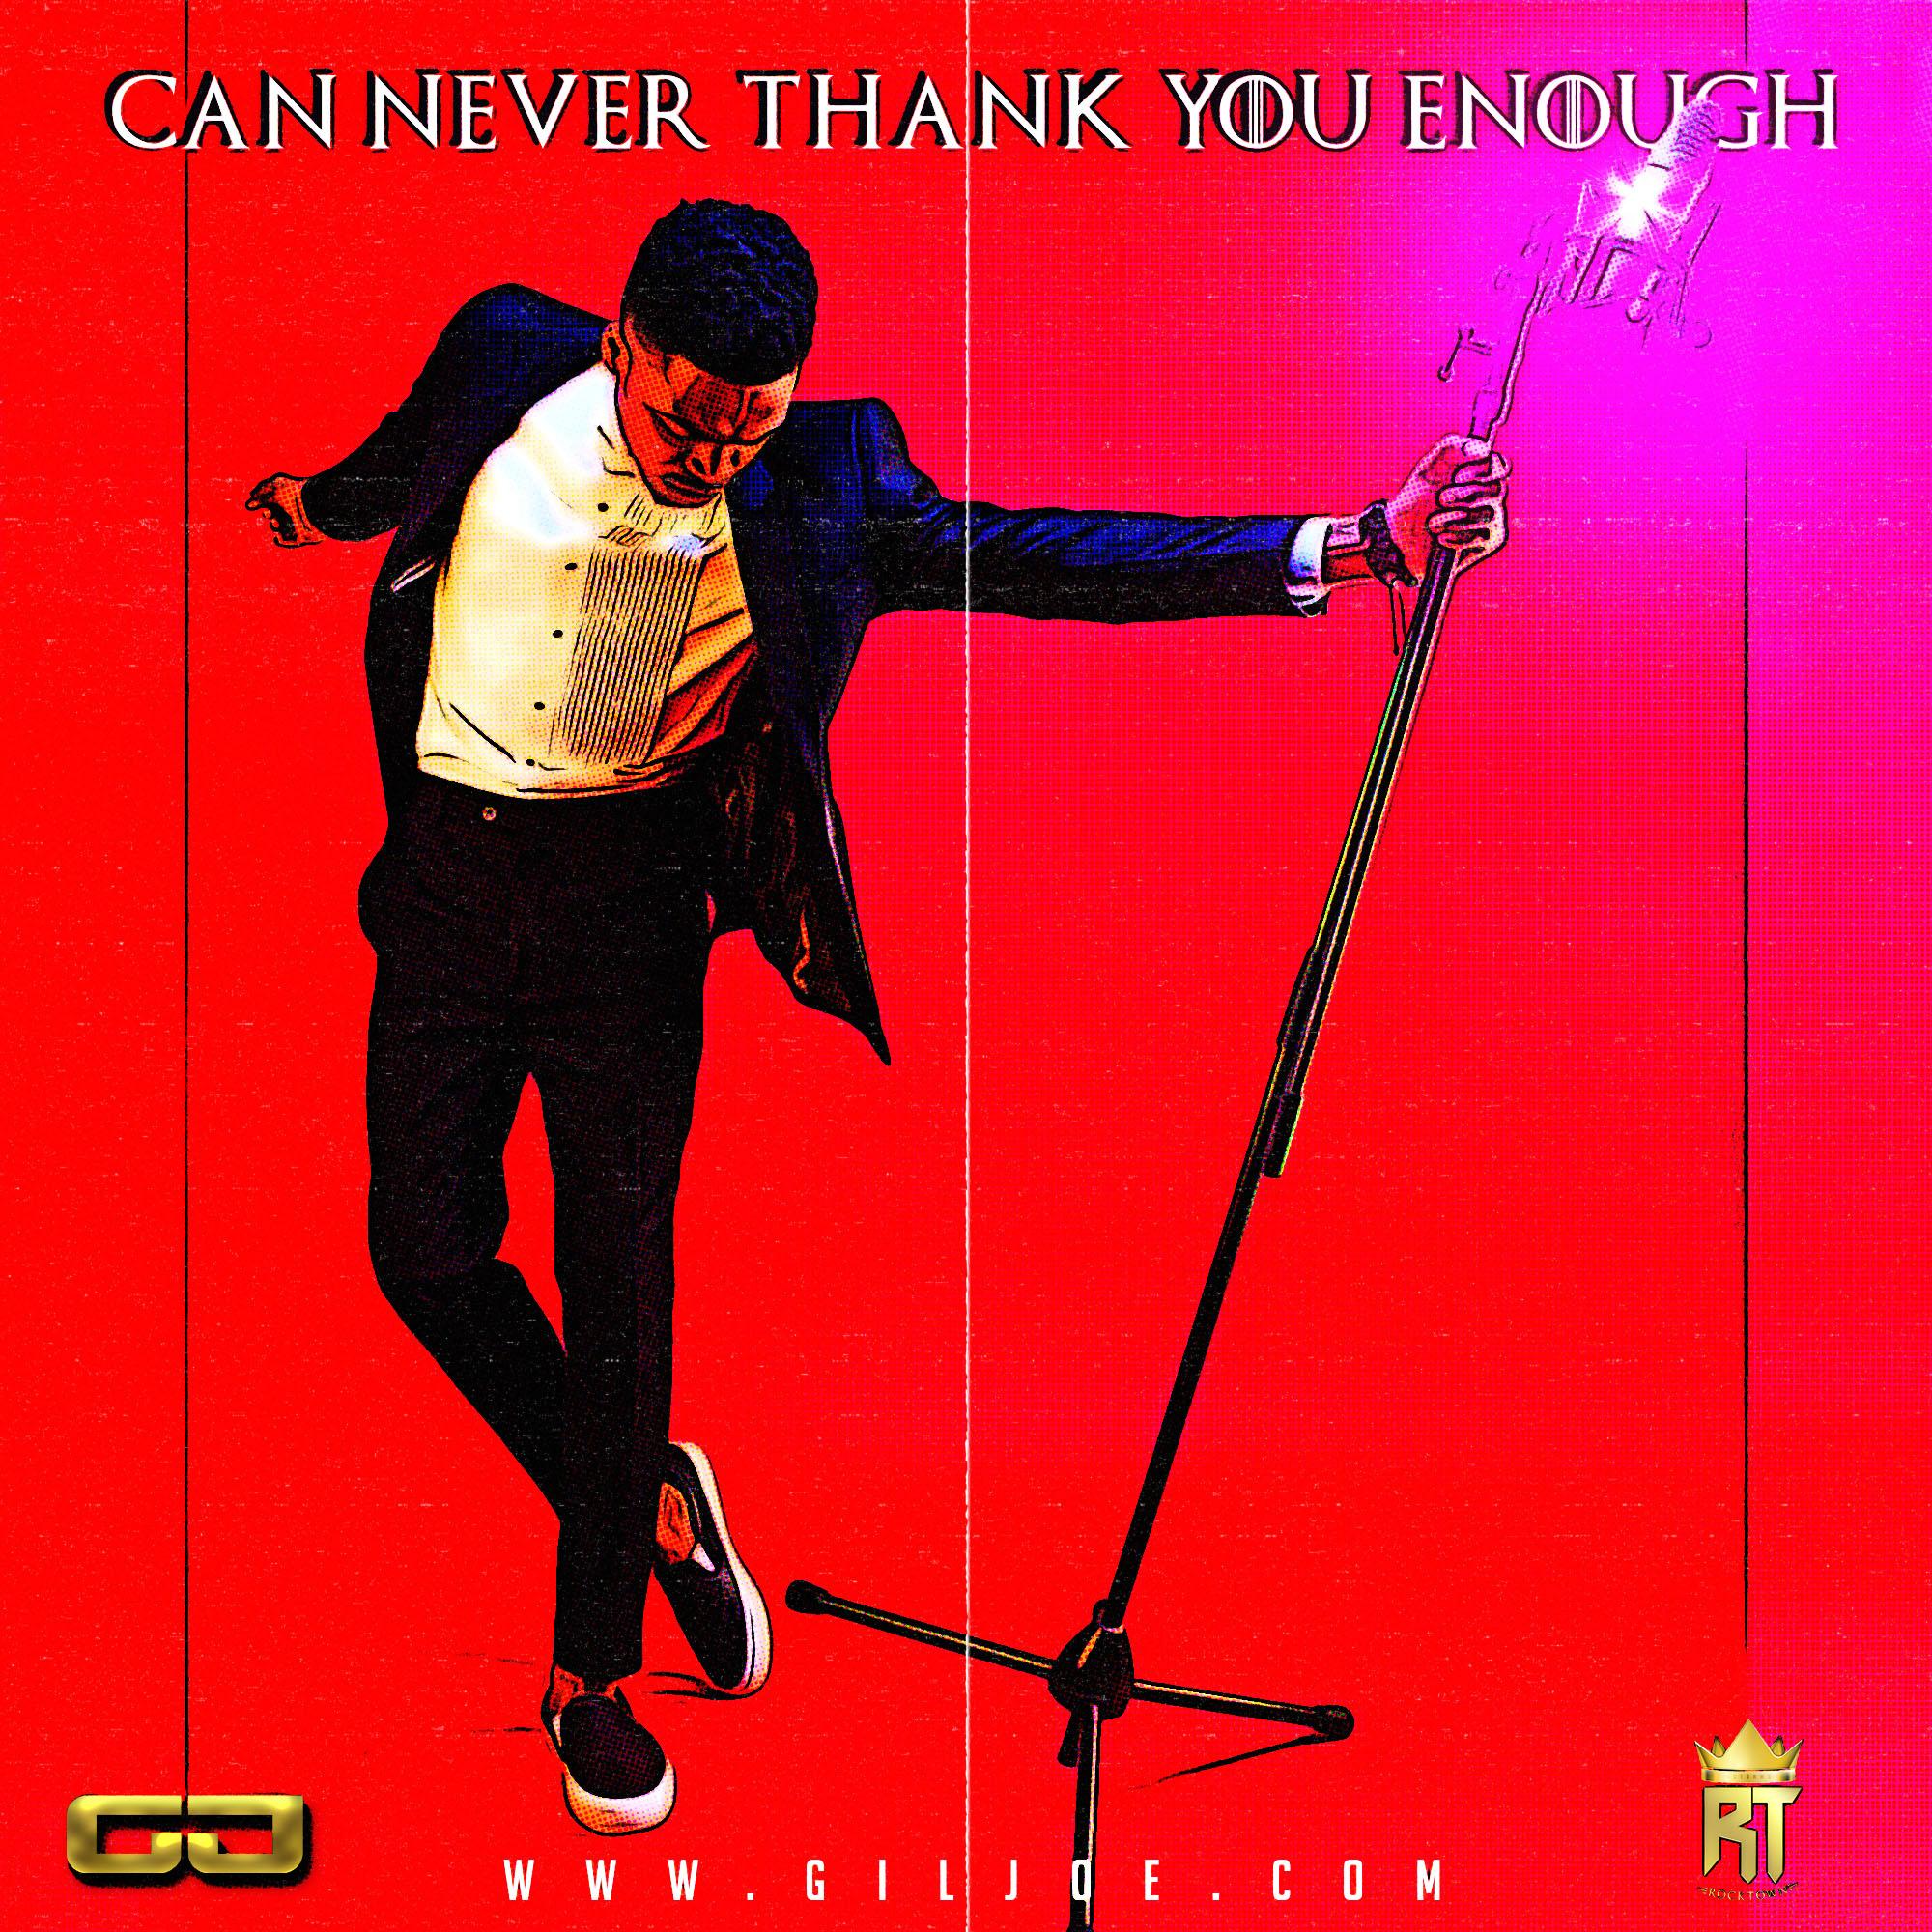 Can Never Thank you Enough - Gil Joe